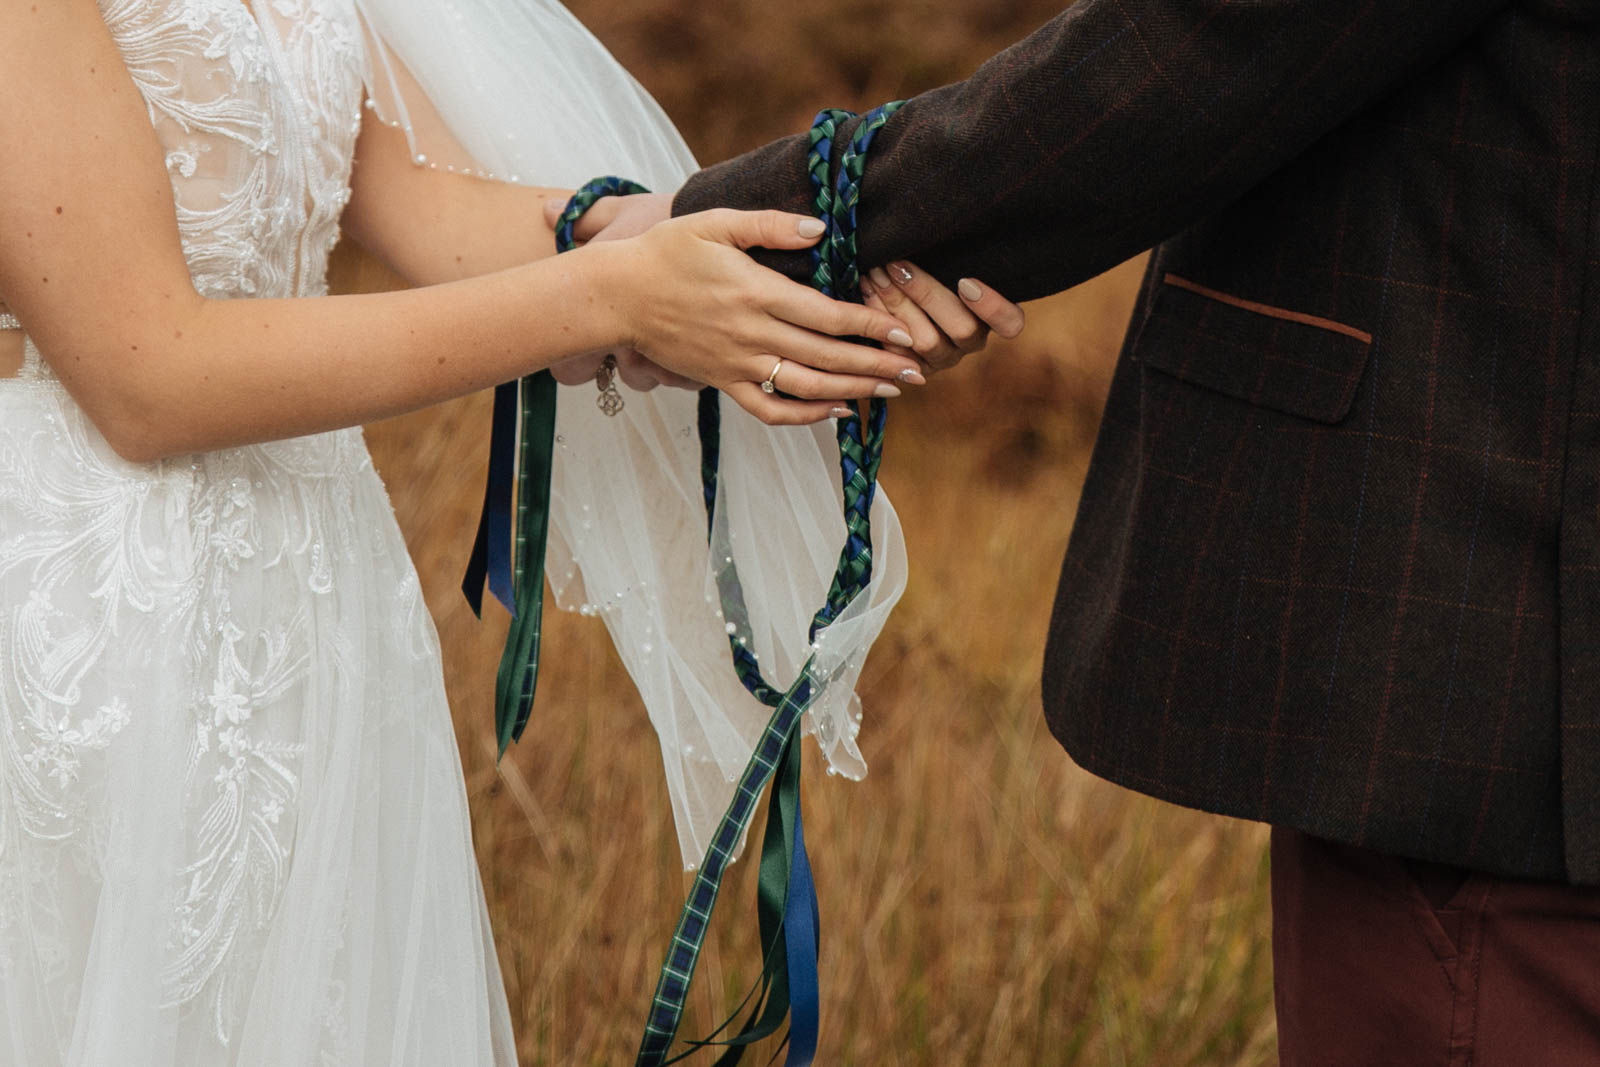 Scottish handfasting - tie the knot